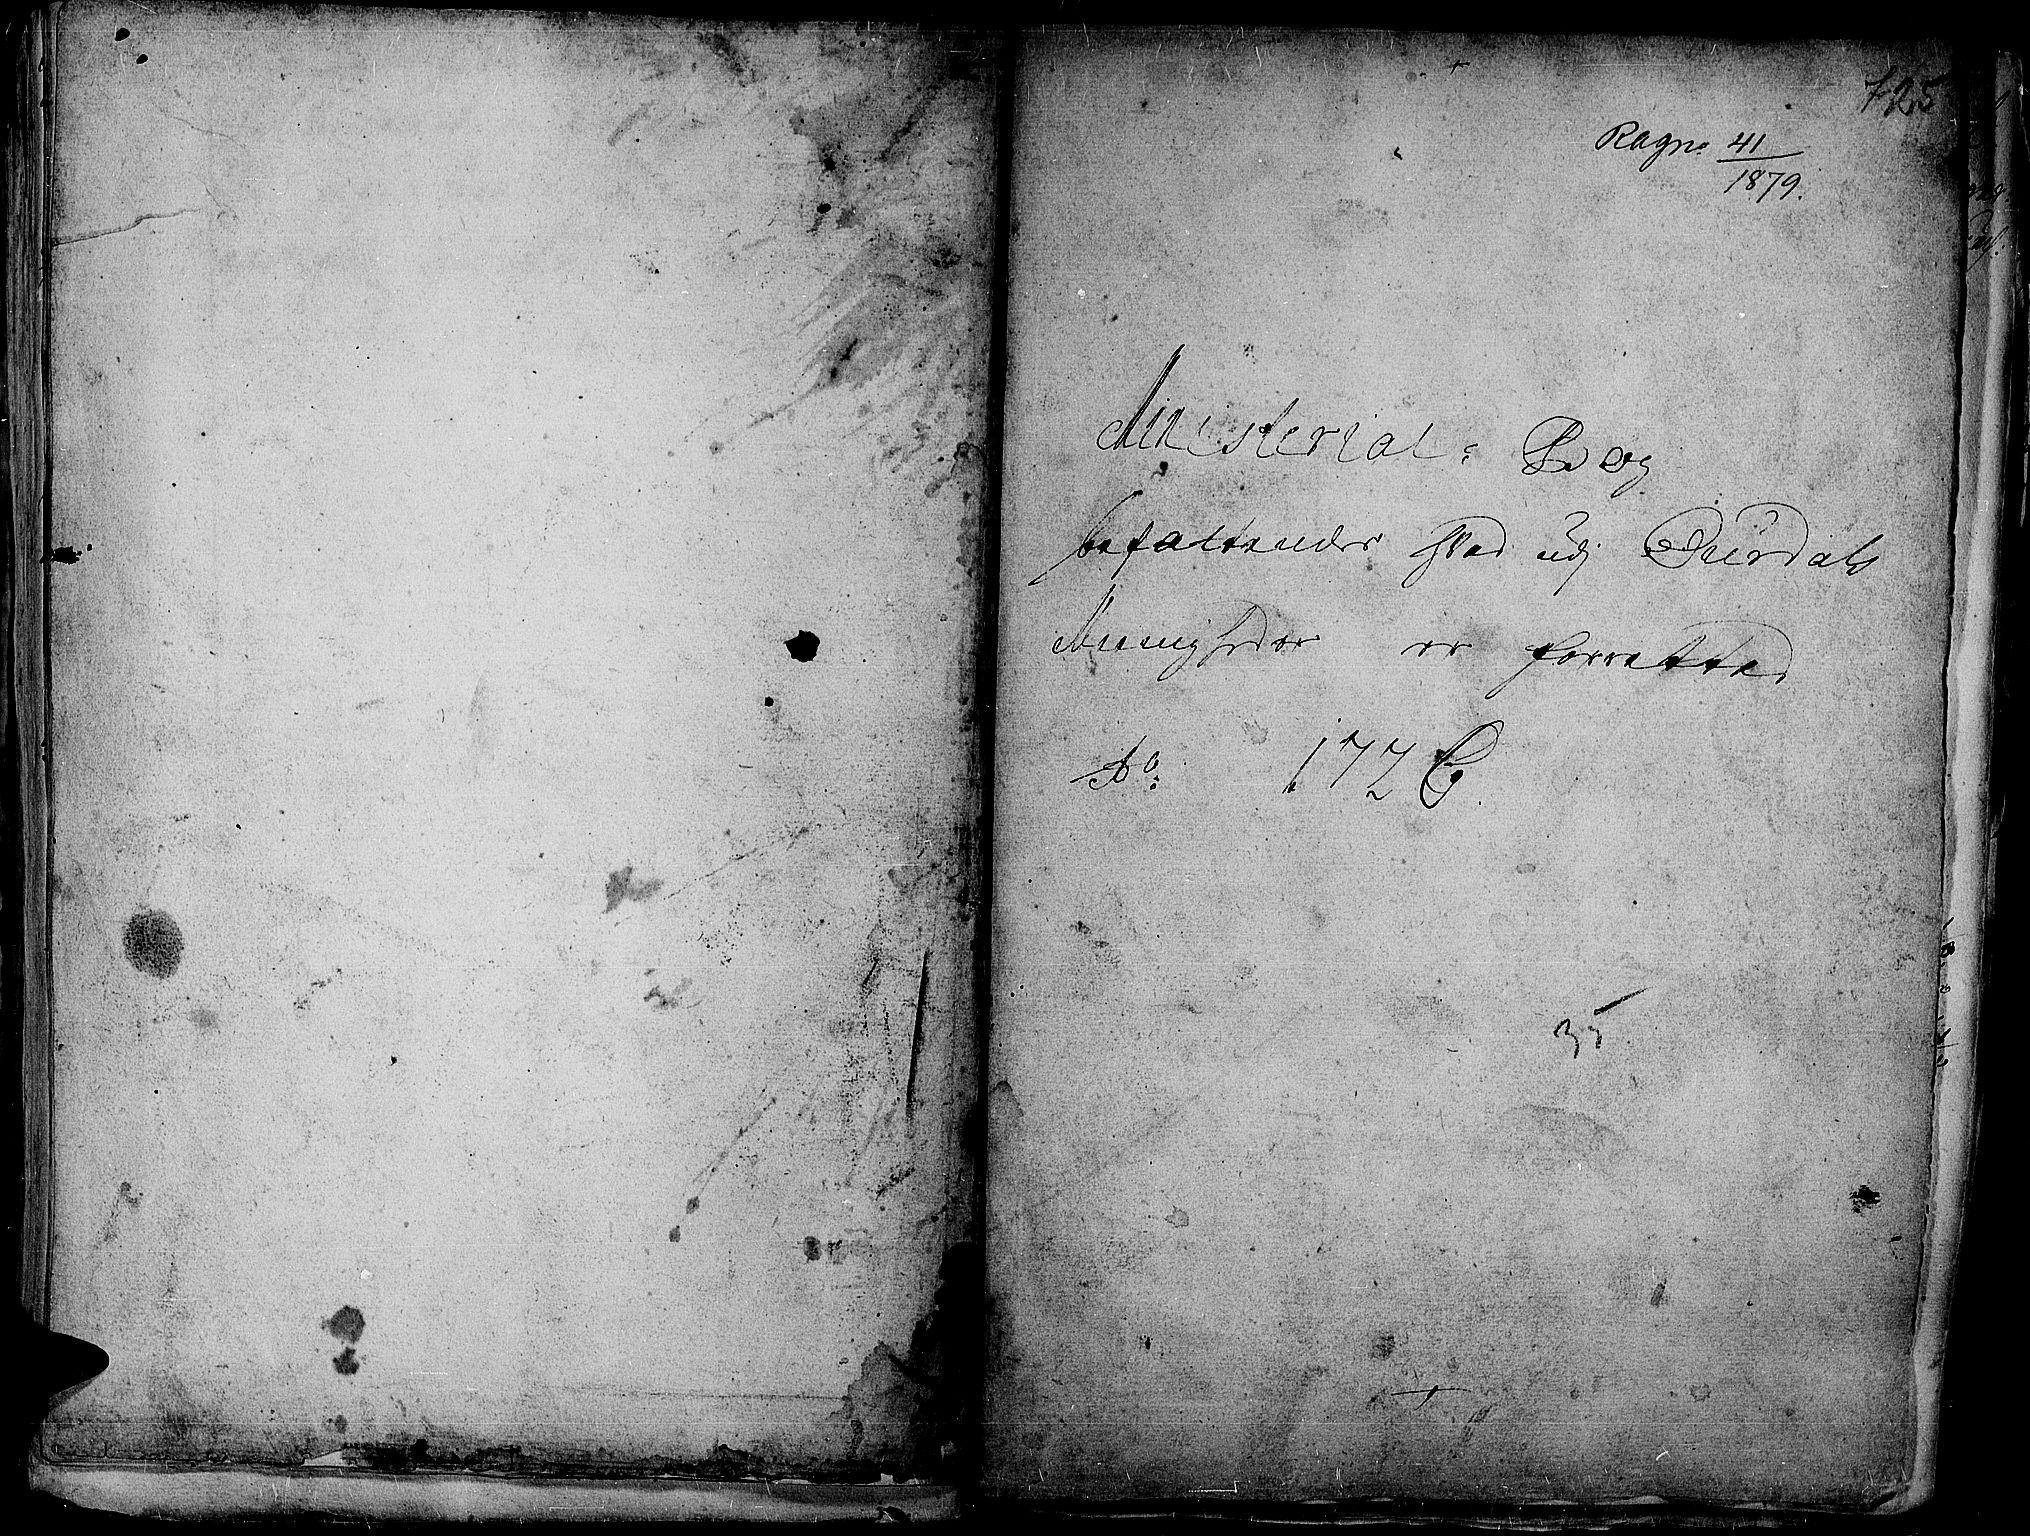 SAH, Aurdal prestekontor, Ministerialbok nr. 1-3, 1692-1730, s. 725